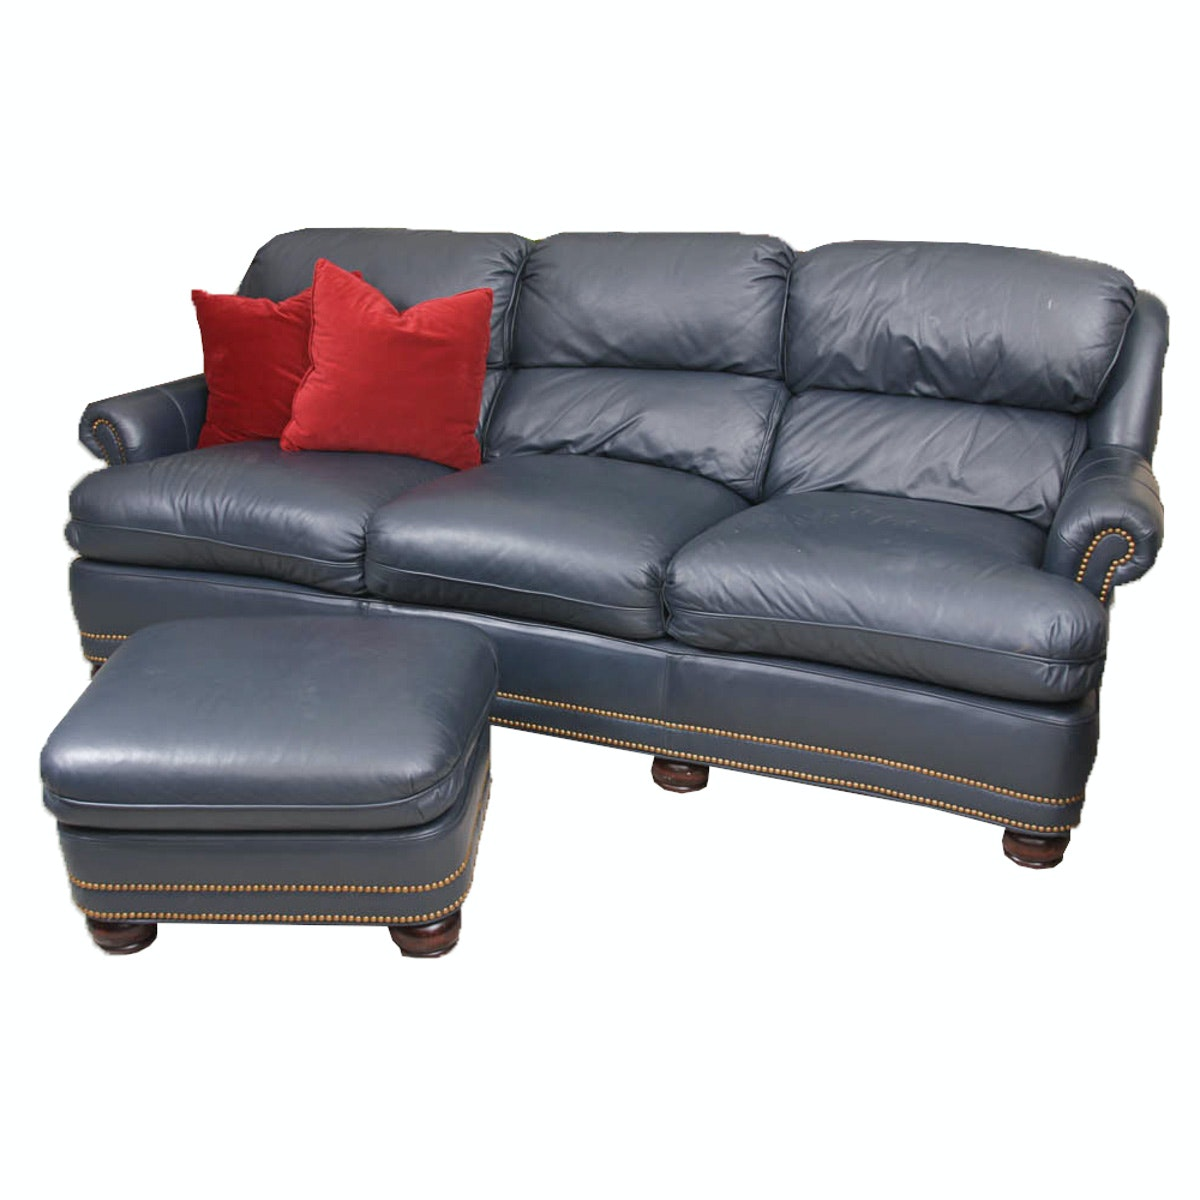 Hancock & Moore Leather Sofa and Ottoman